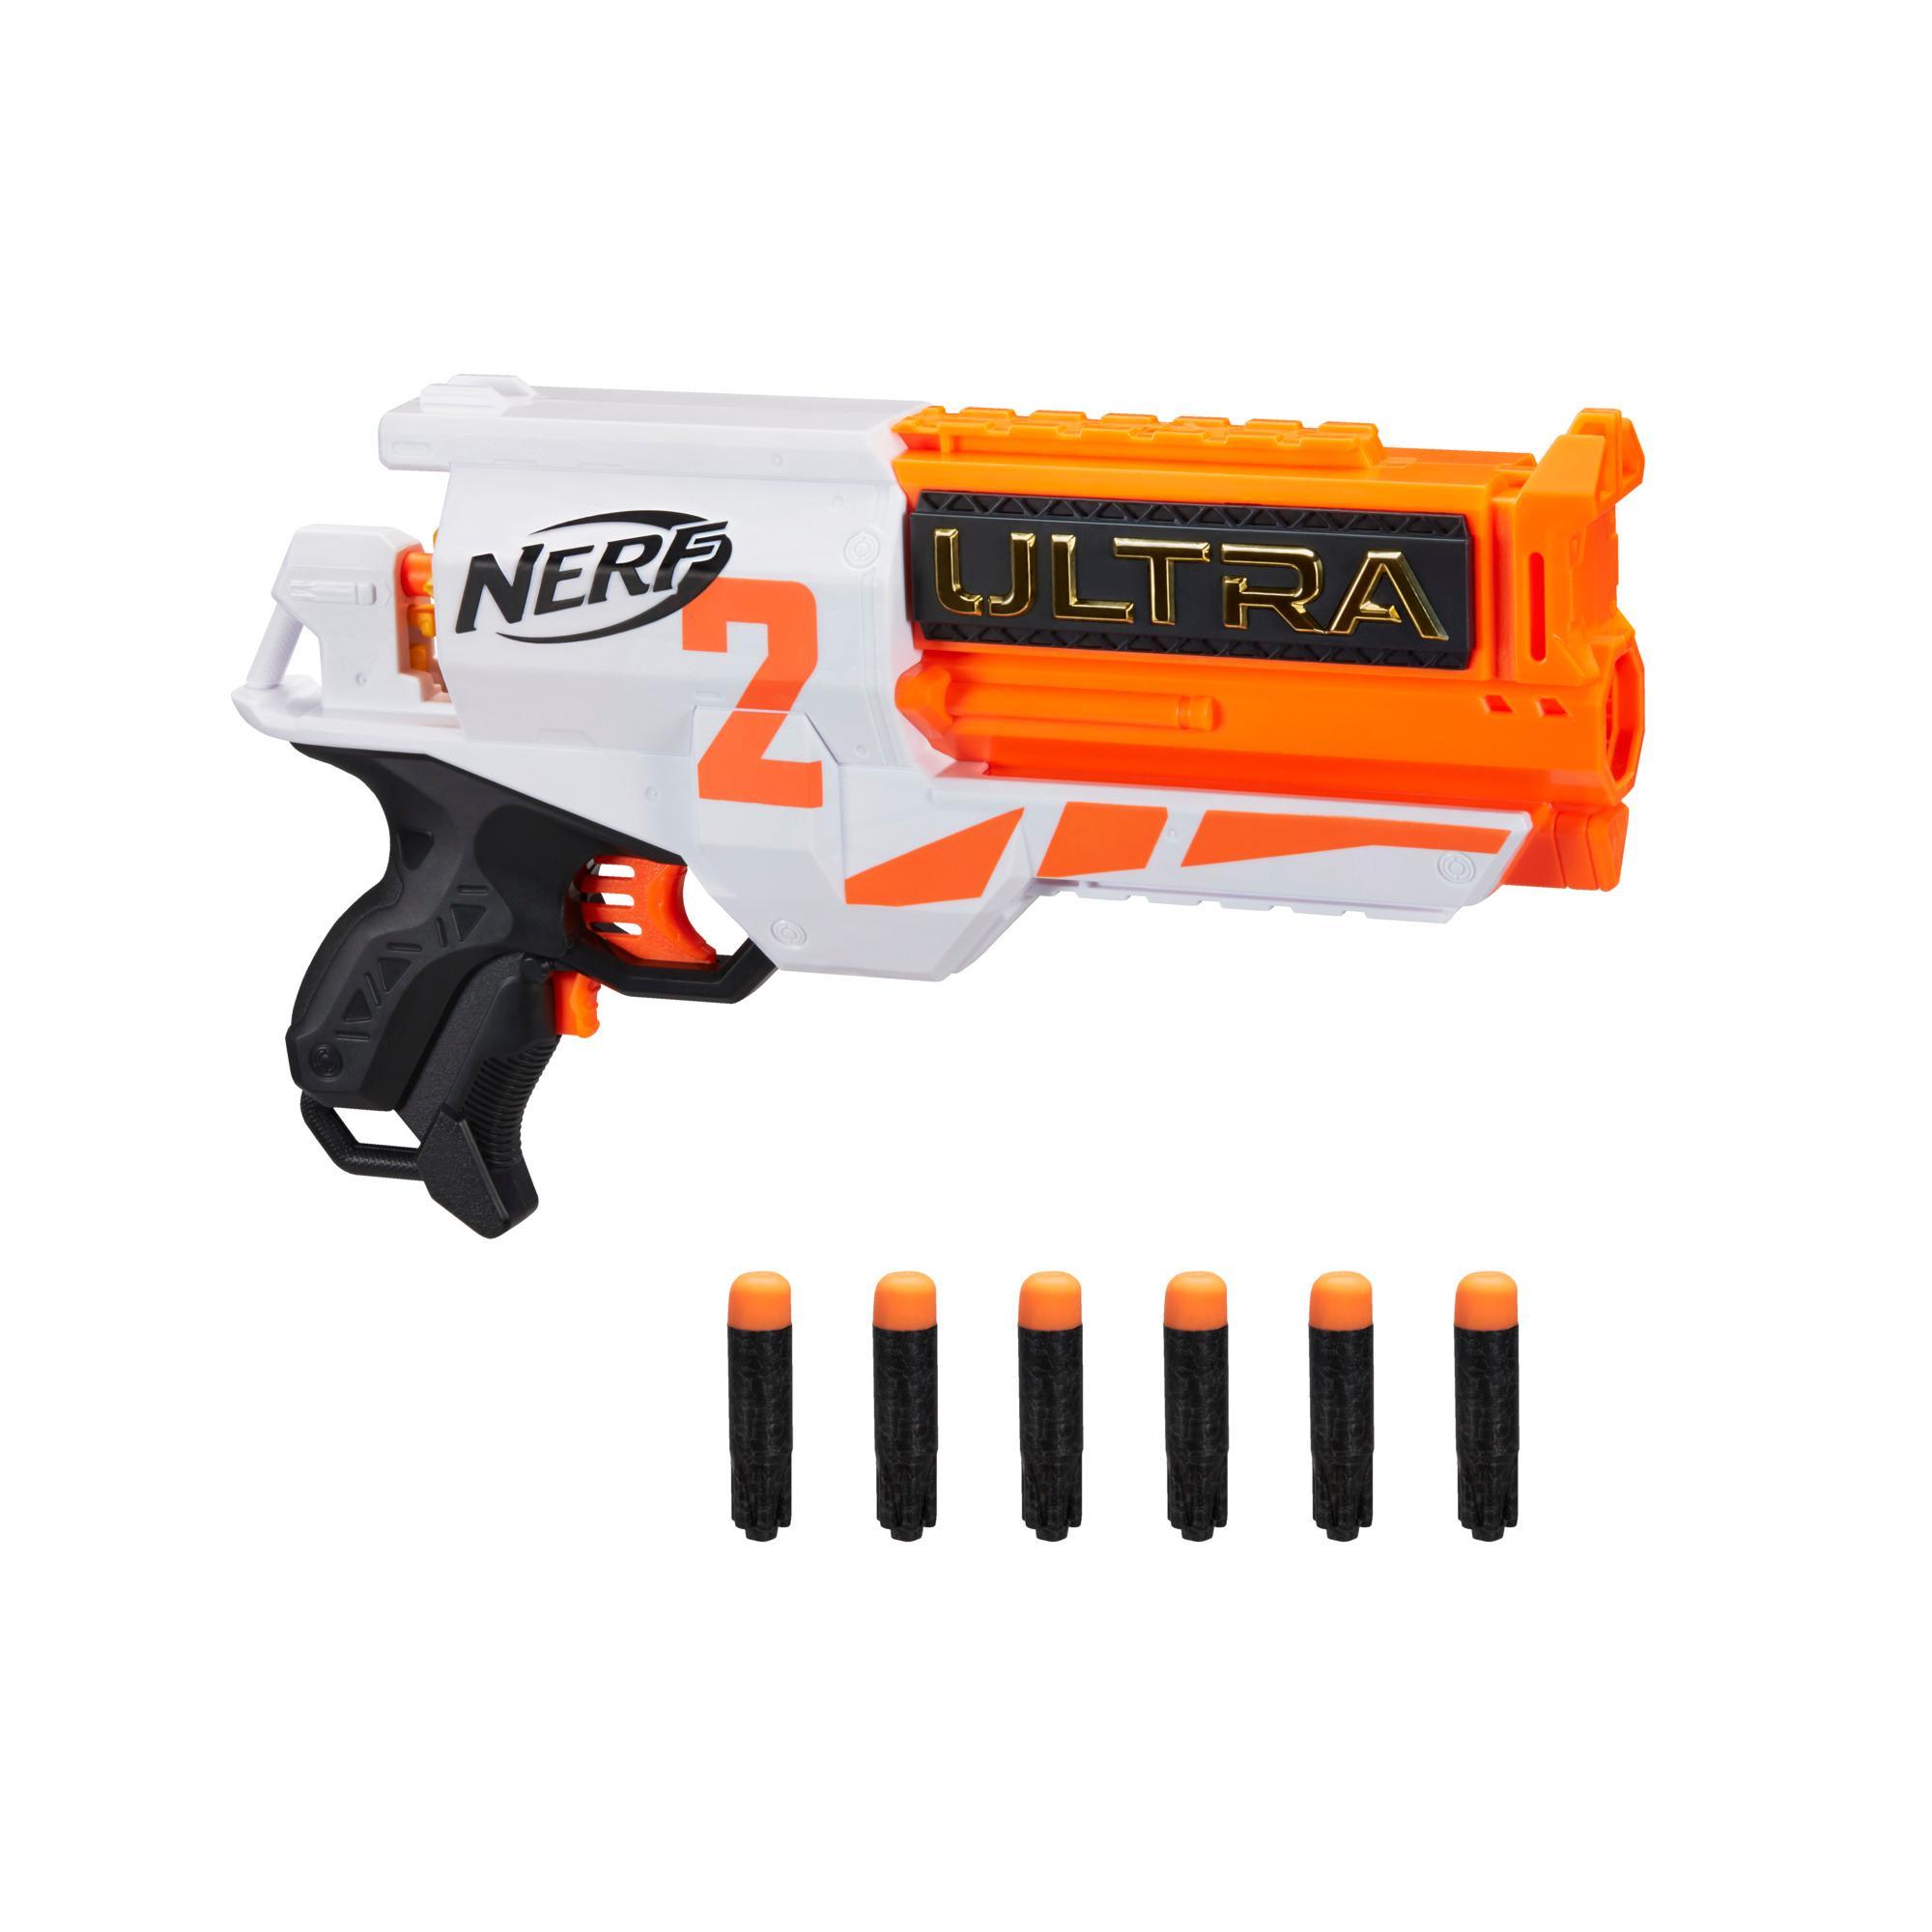 Nerf Ultra Two - Blaster motorisé, recharge rapide, inclut 6 fléchettes Nerf Ultra, compatible uniquement avec les fléchettes Nerf Ultra